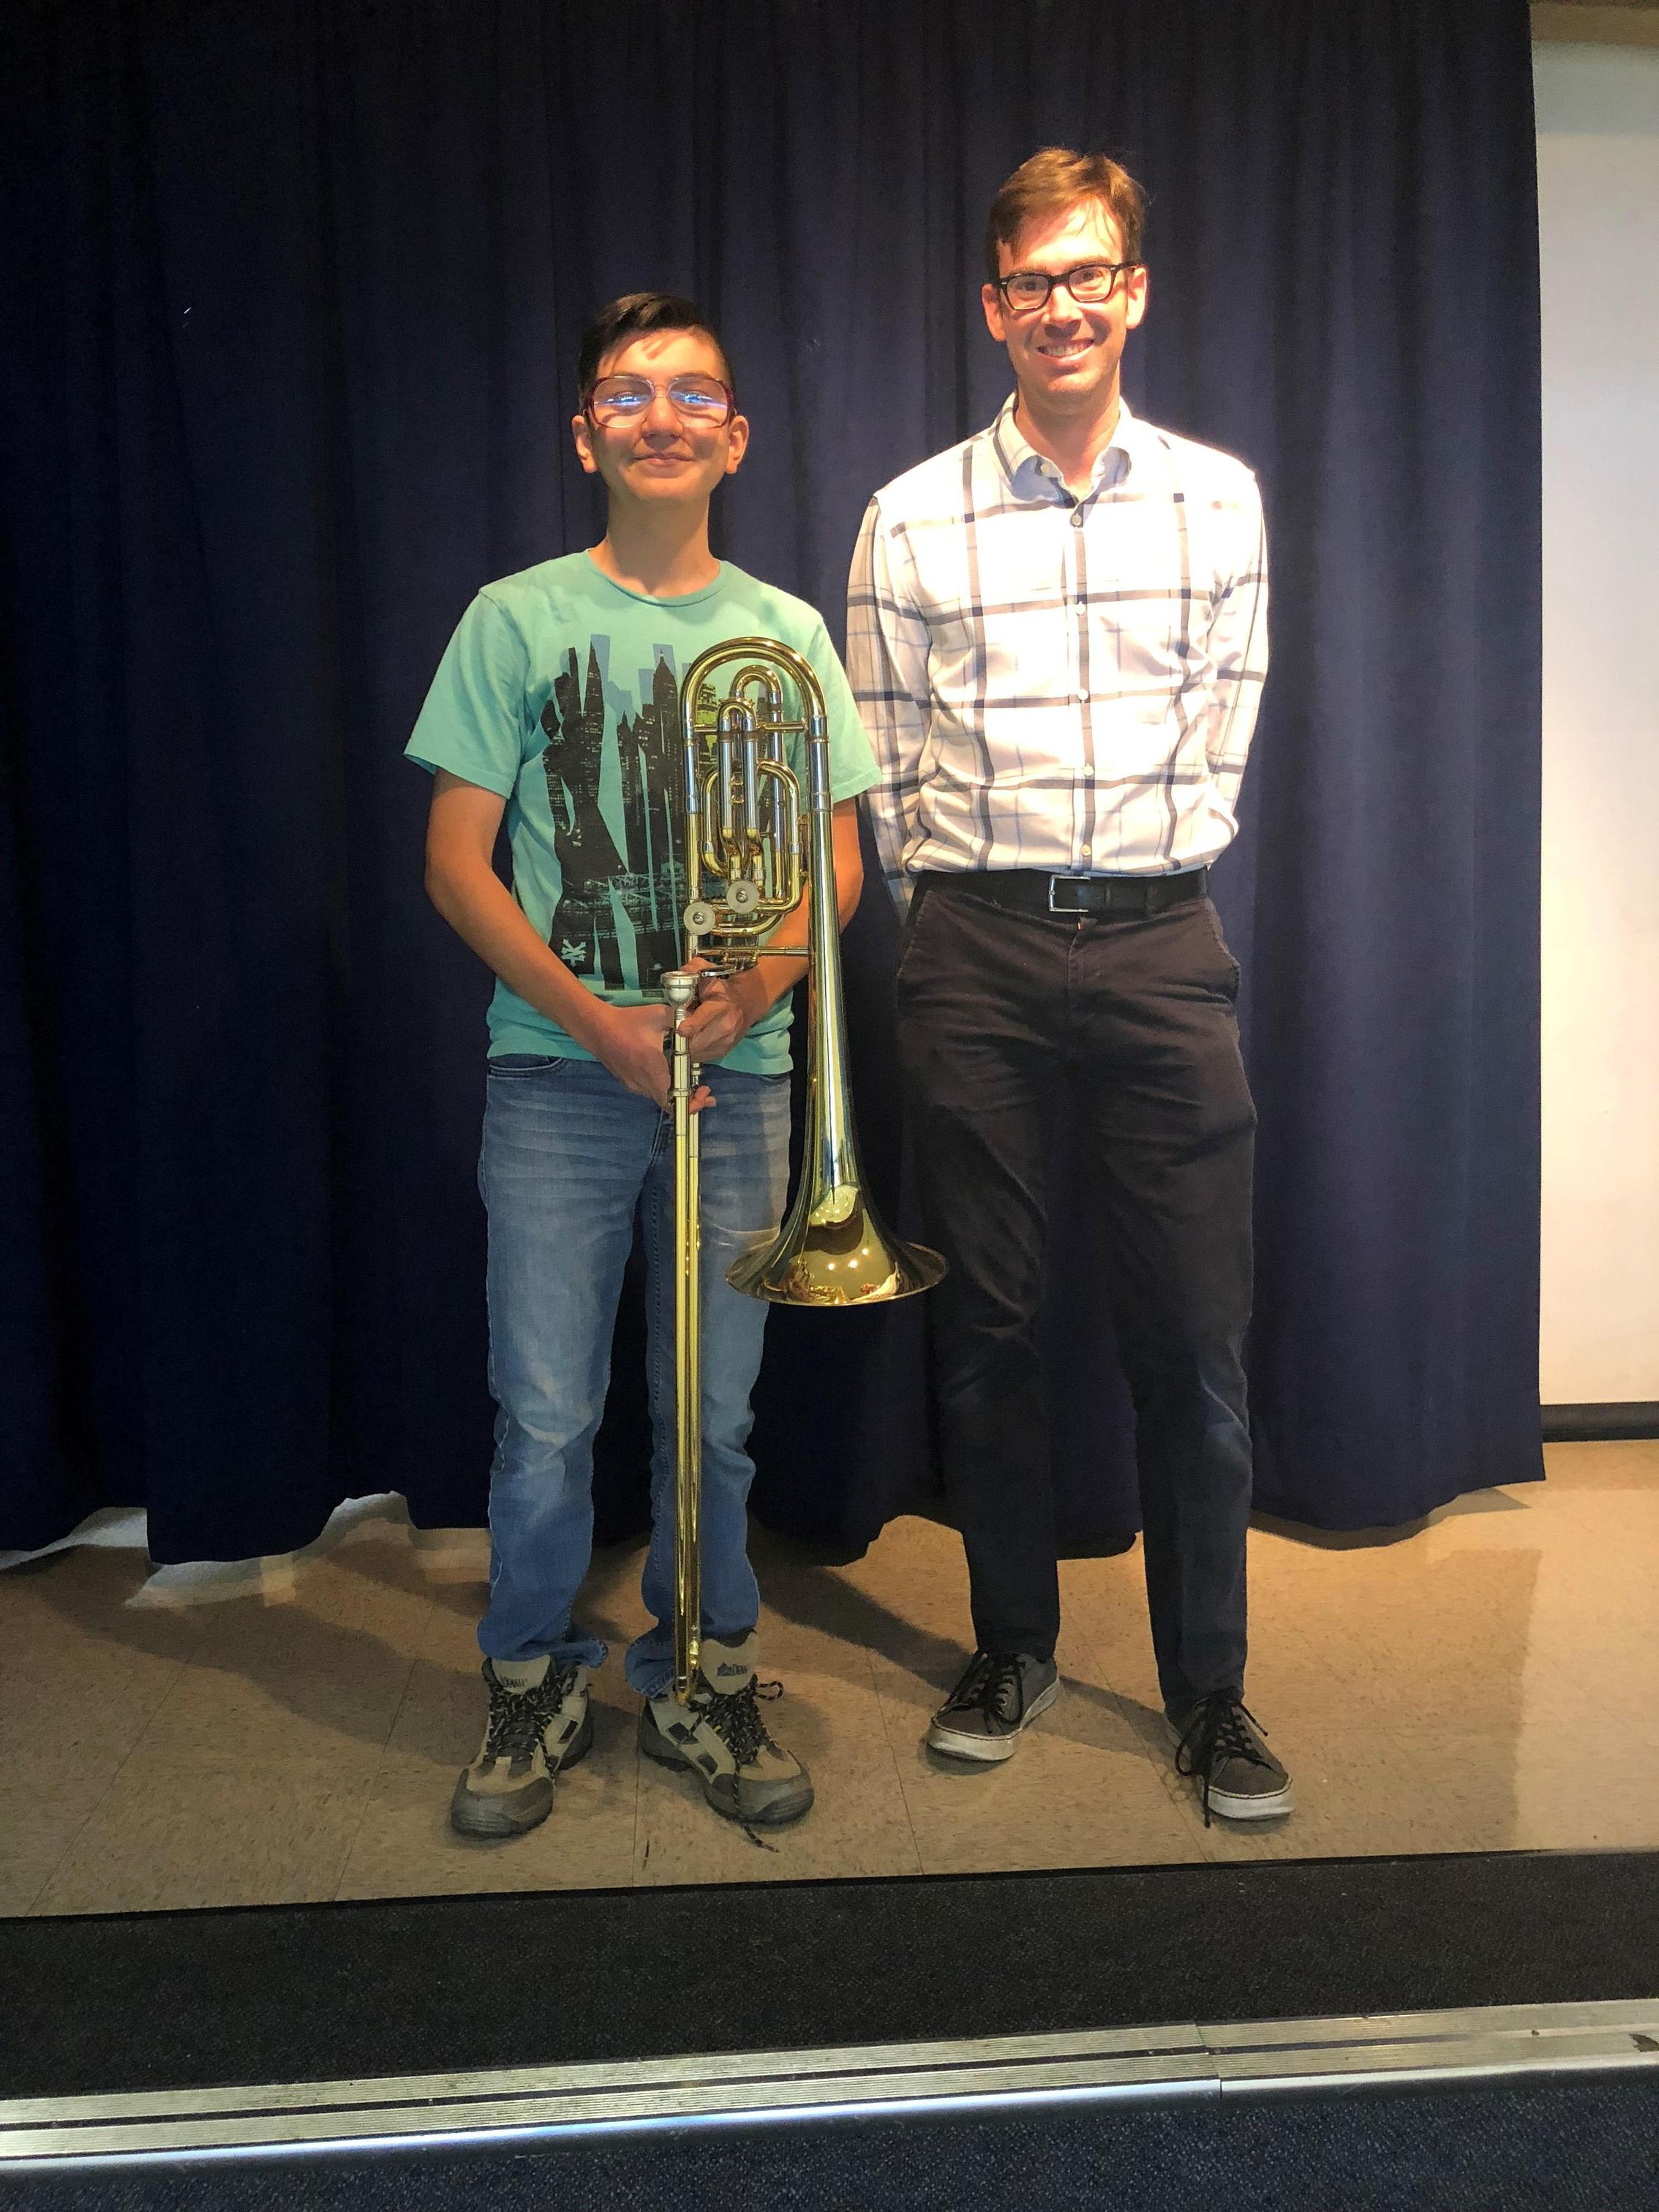 Alexander Gonzales and Mr. Dolan